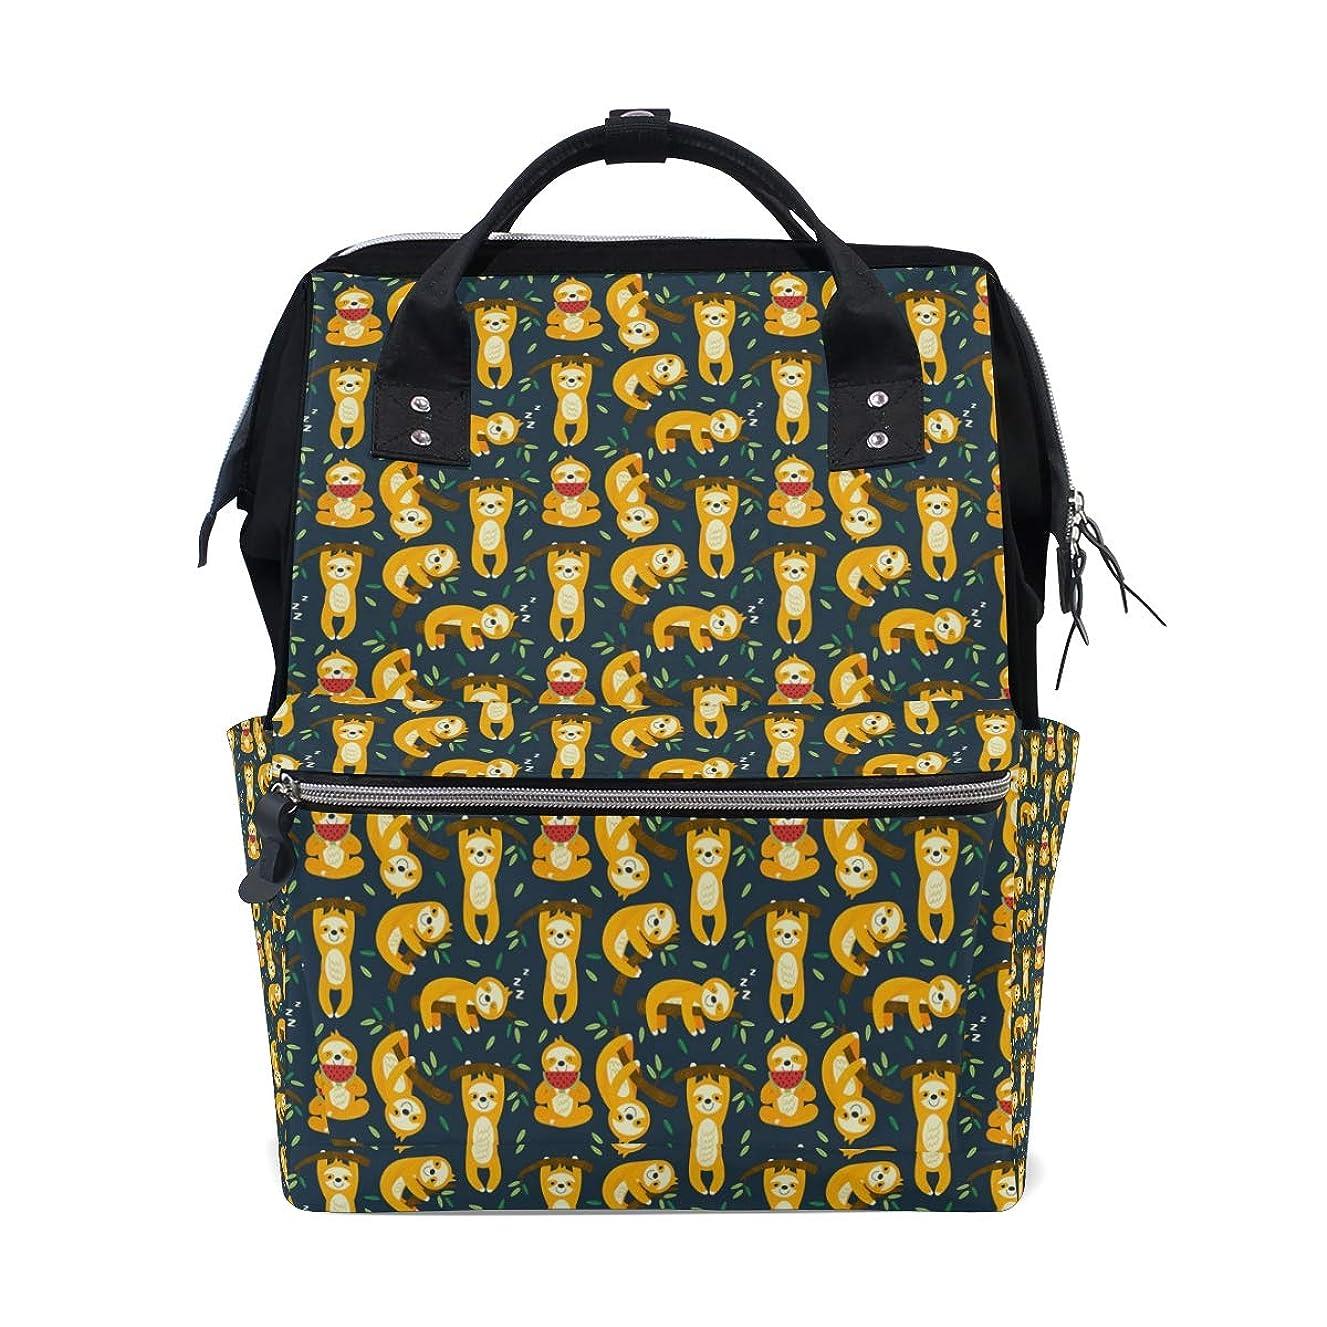 Backpack Green Cartoon Sloth School Rucksack Diaper Bags Travel Shoulder Large Capacity Bookbag for Women Men